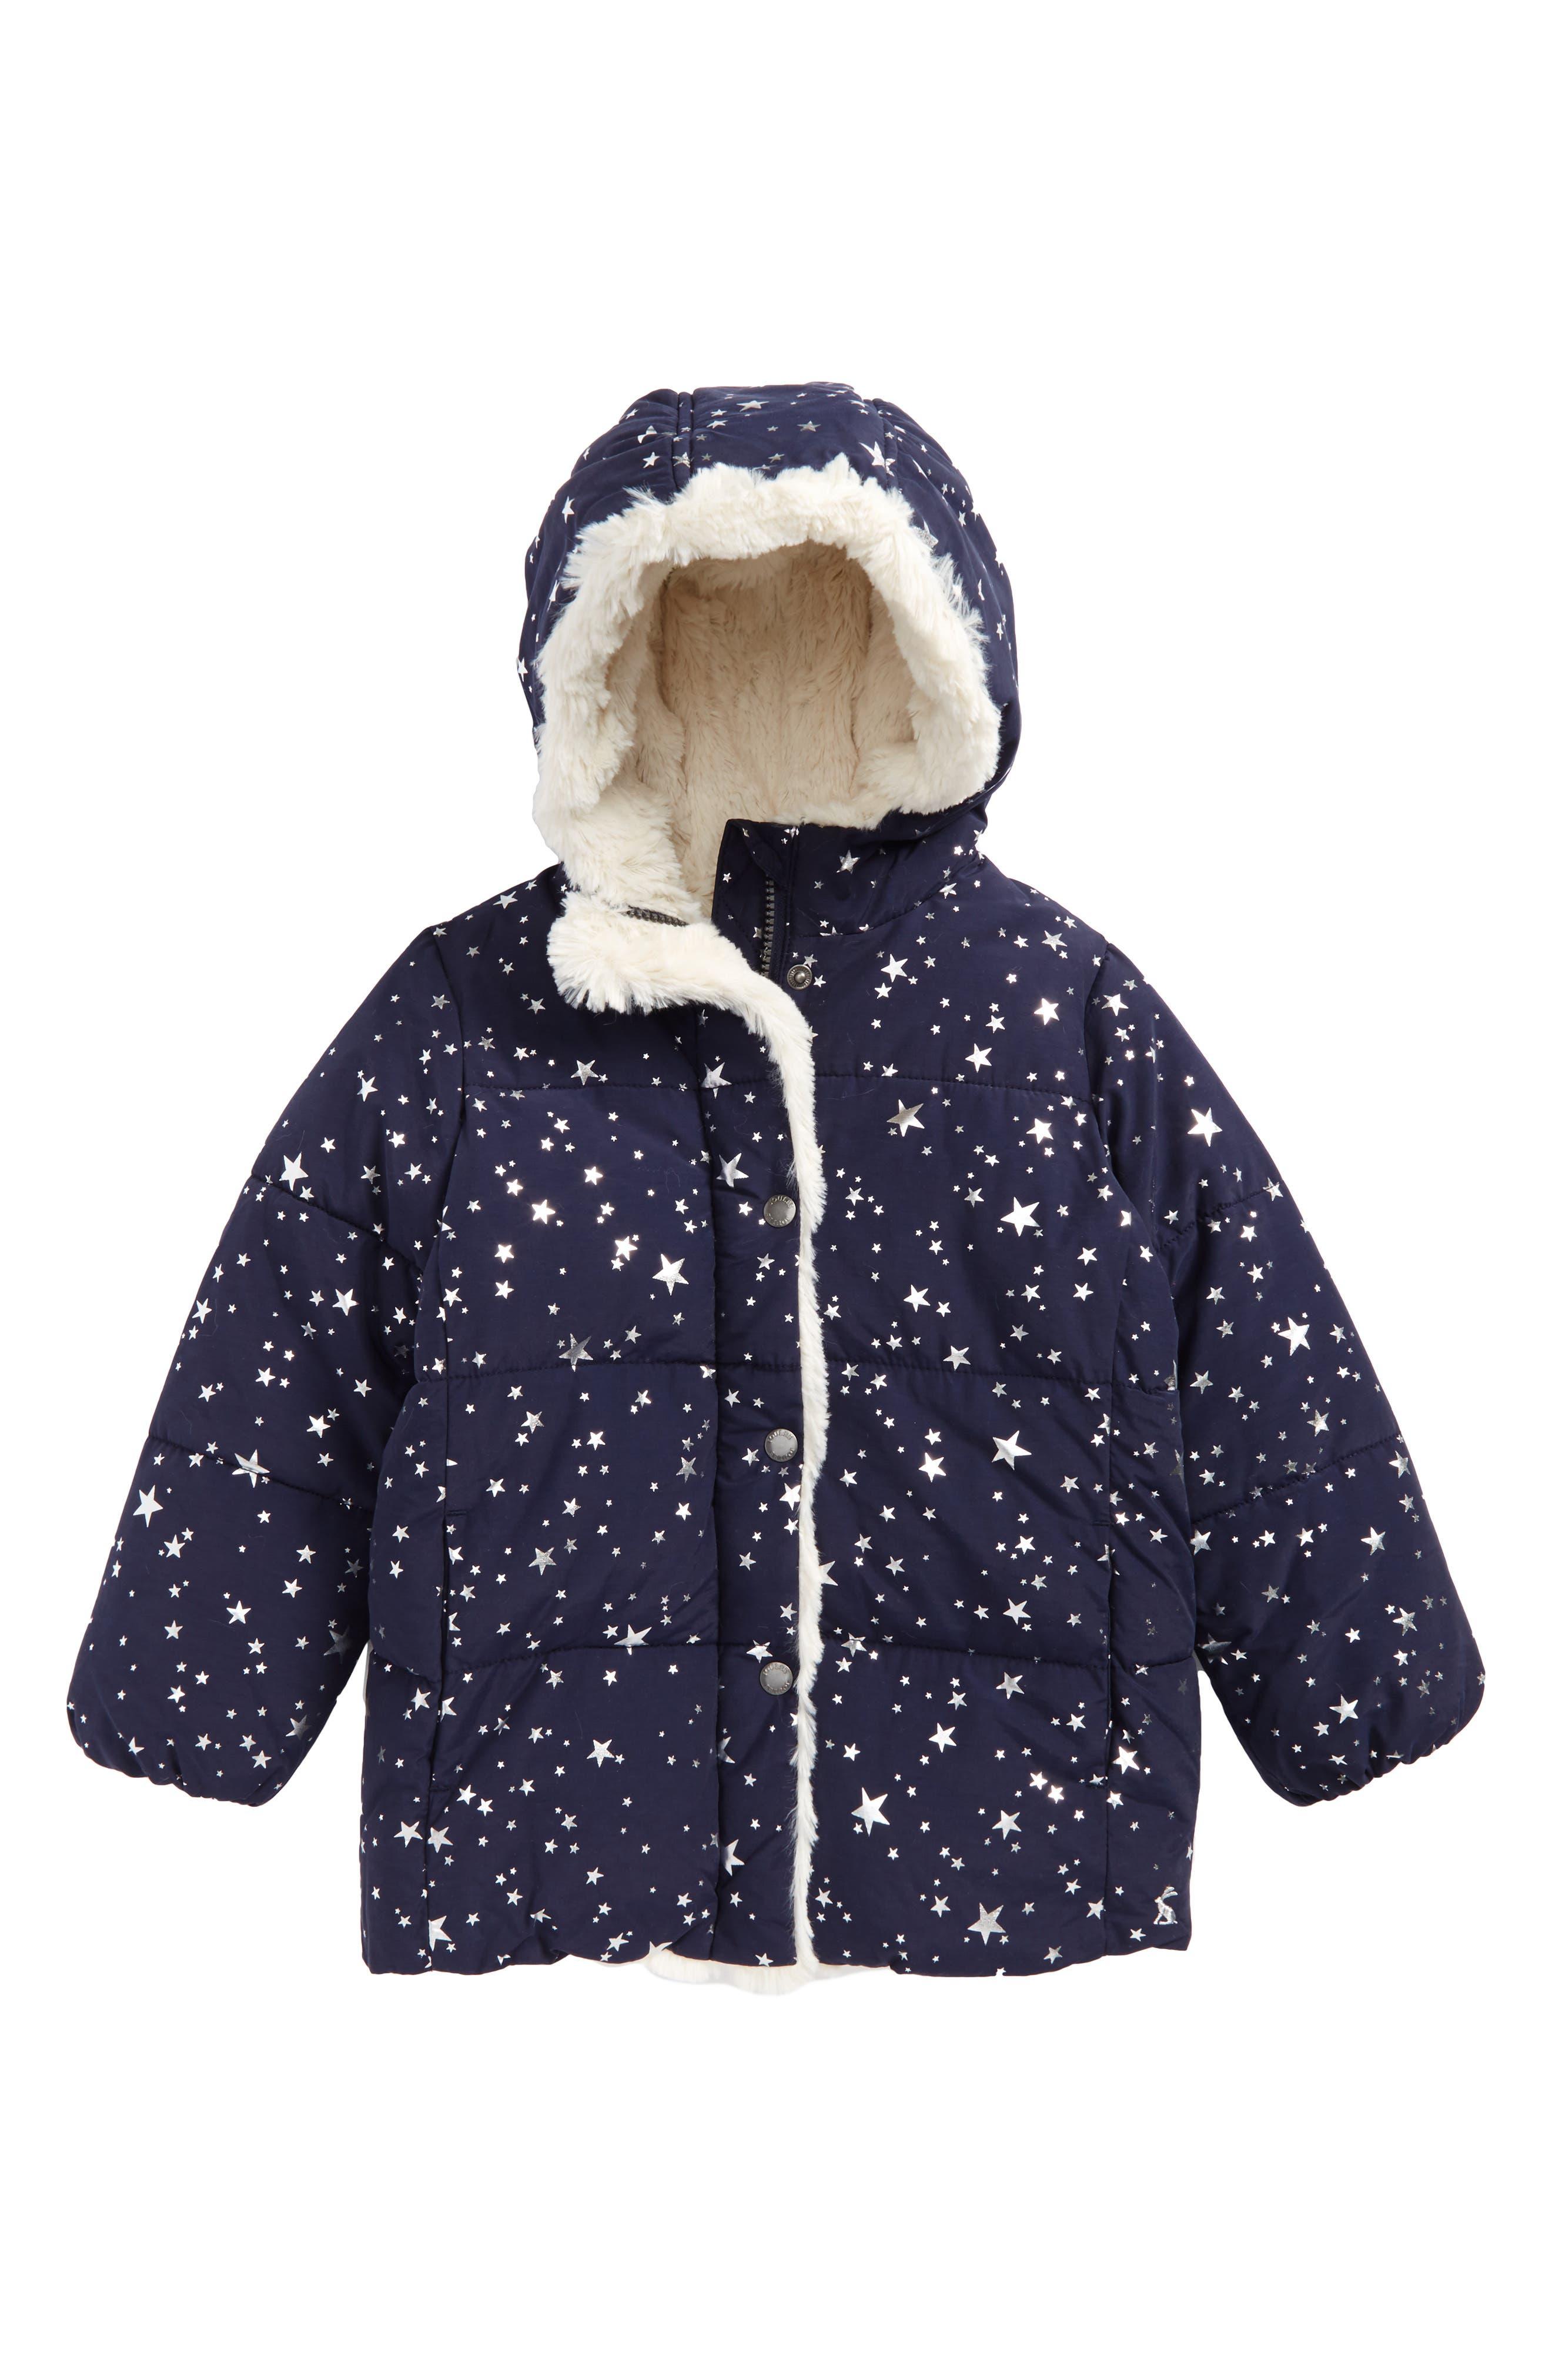 Alternate Image 1 Selected - Joules Faux Fur Trim Hooded Puffer Jacket (Toddler Girls & Little Girls)